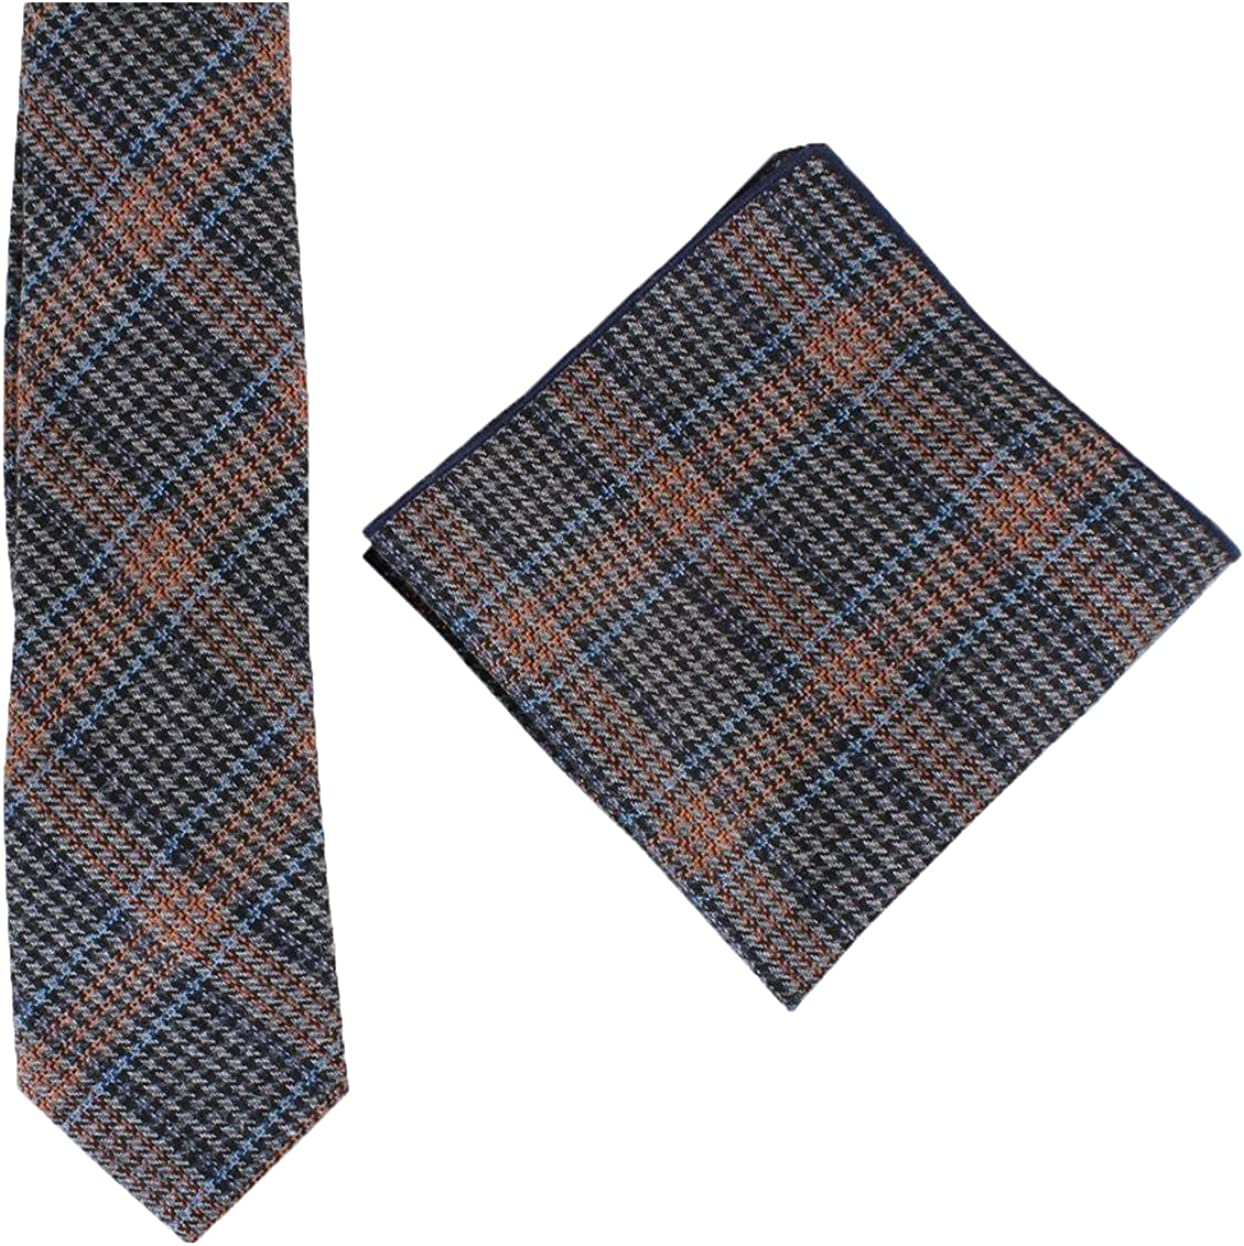 Knightsbridge Neckwear Mens Prince of Wales Check Tie and Pocket Square Set - Blue/Orange/Grey